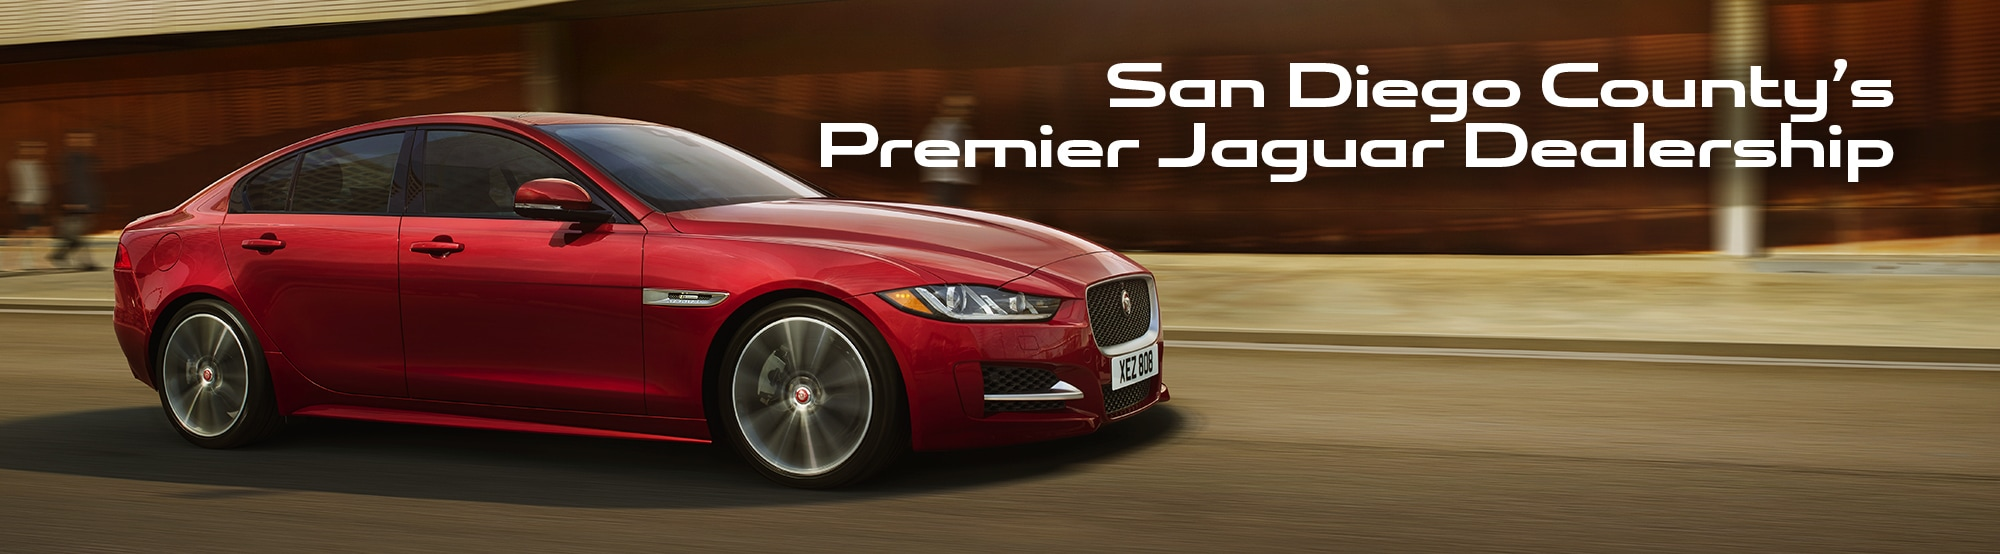 m slide pre jaguar near san tx dealers new me dealership antonio xe barrett owned